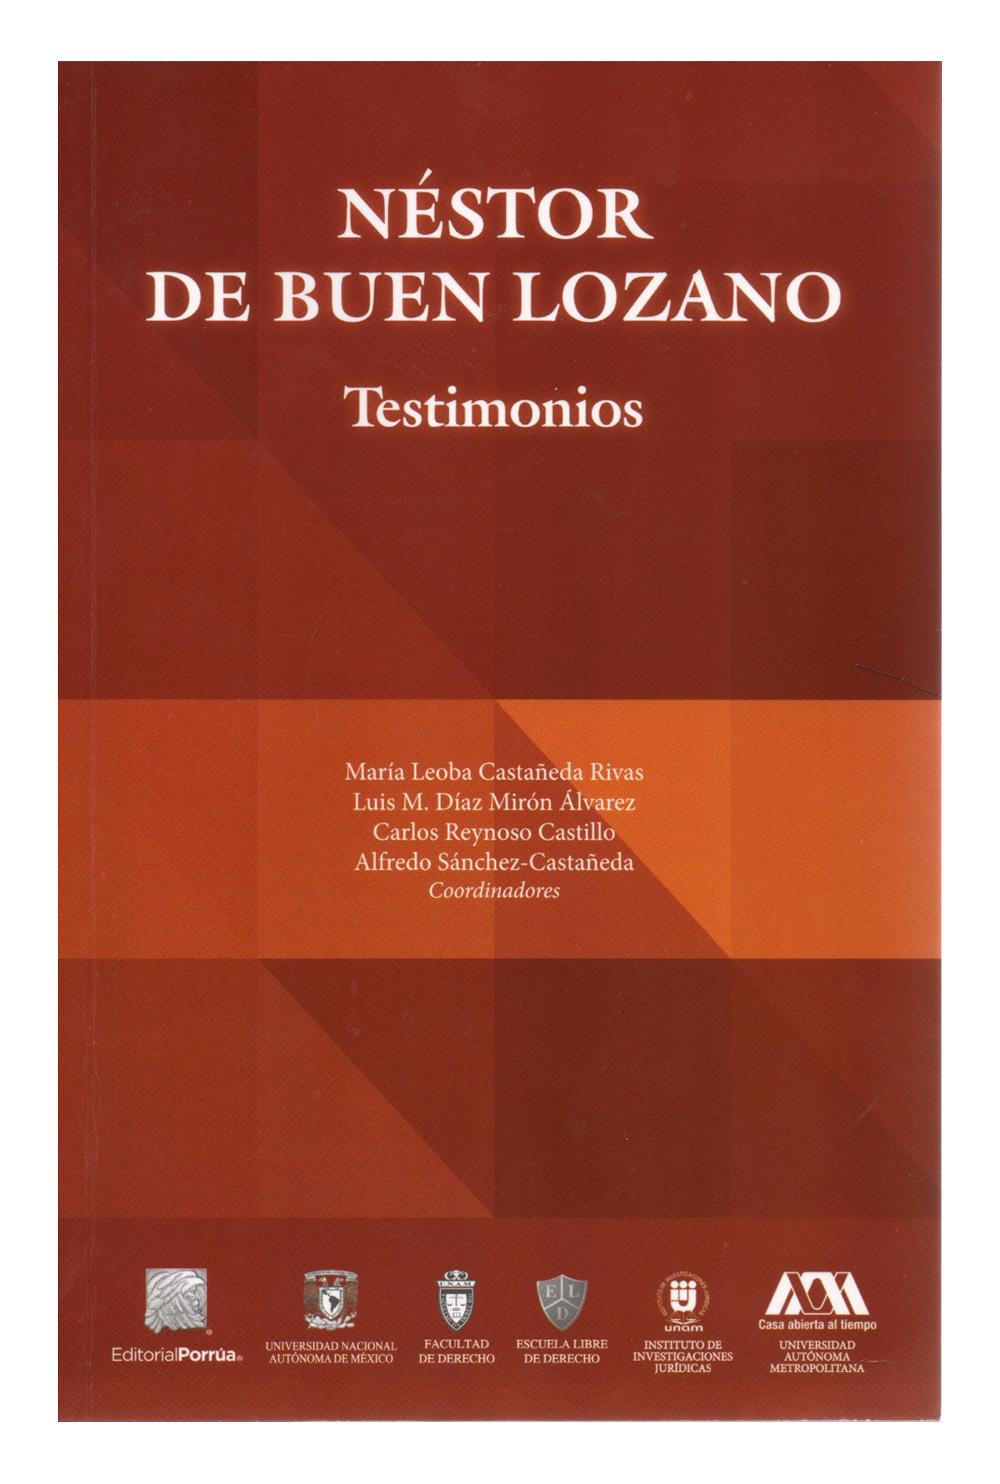 Néstor de Buen Lozano. Testimonios